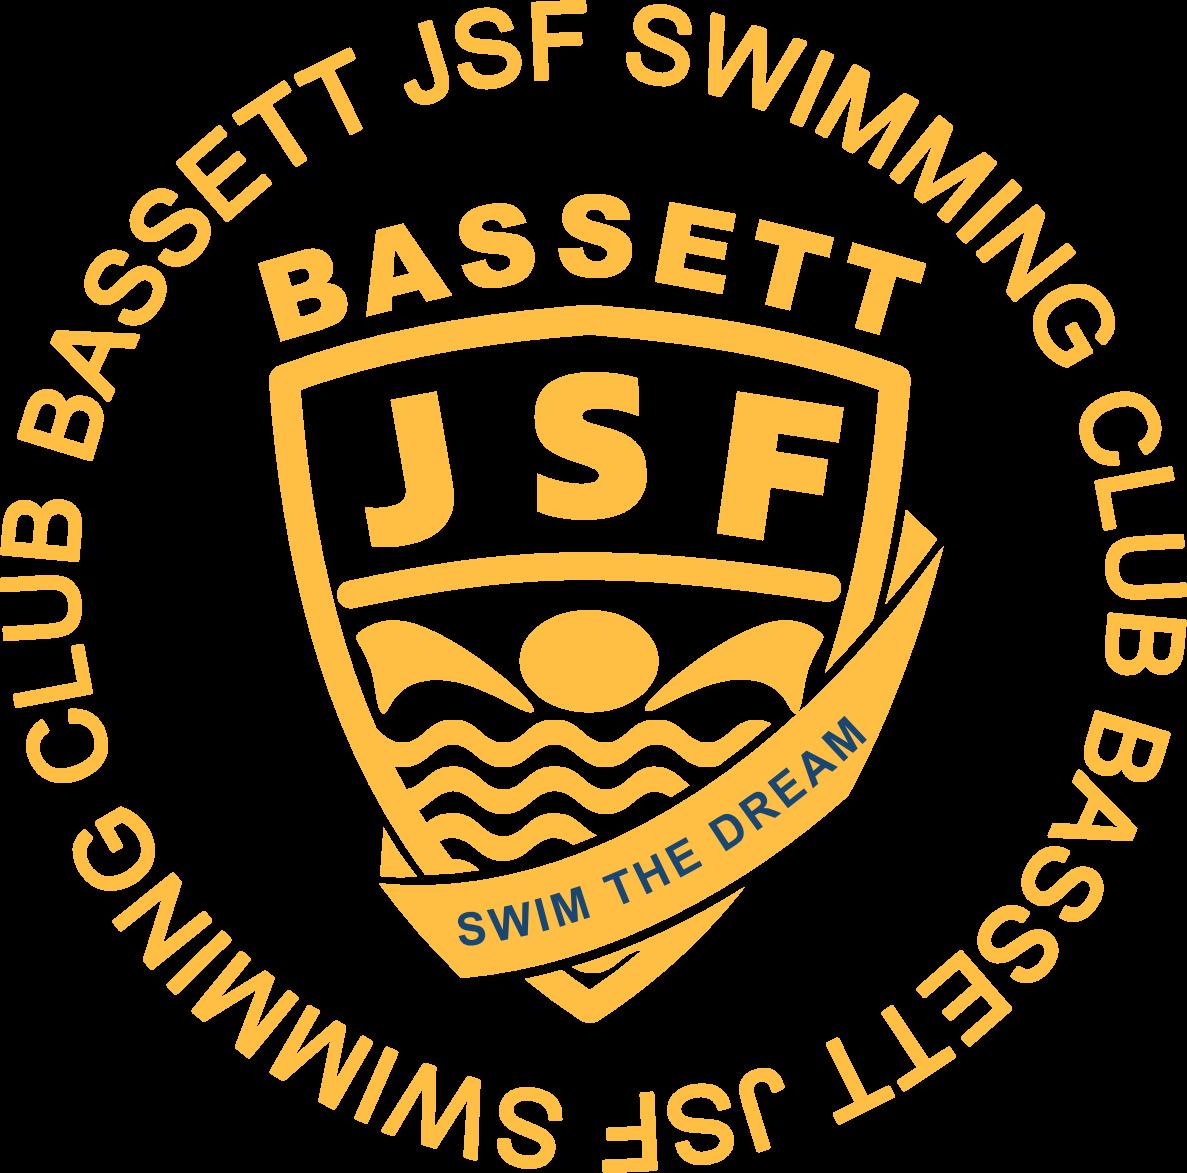 Bassett JSF